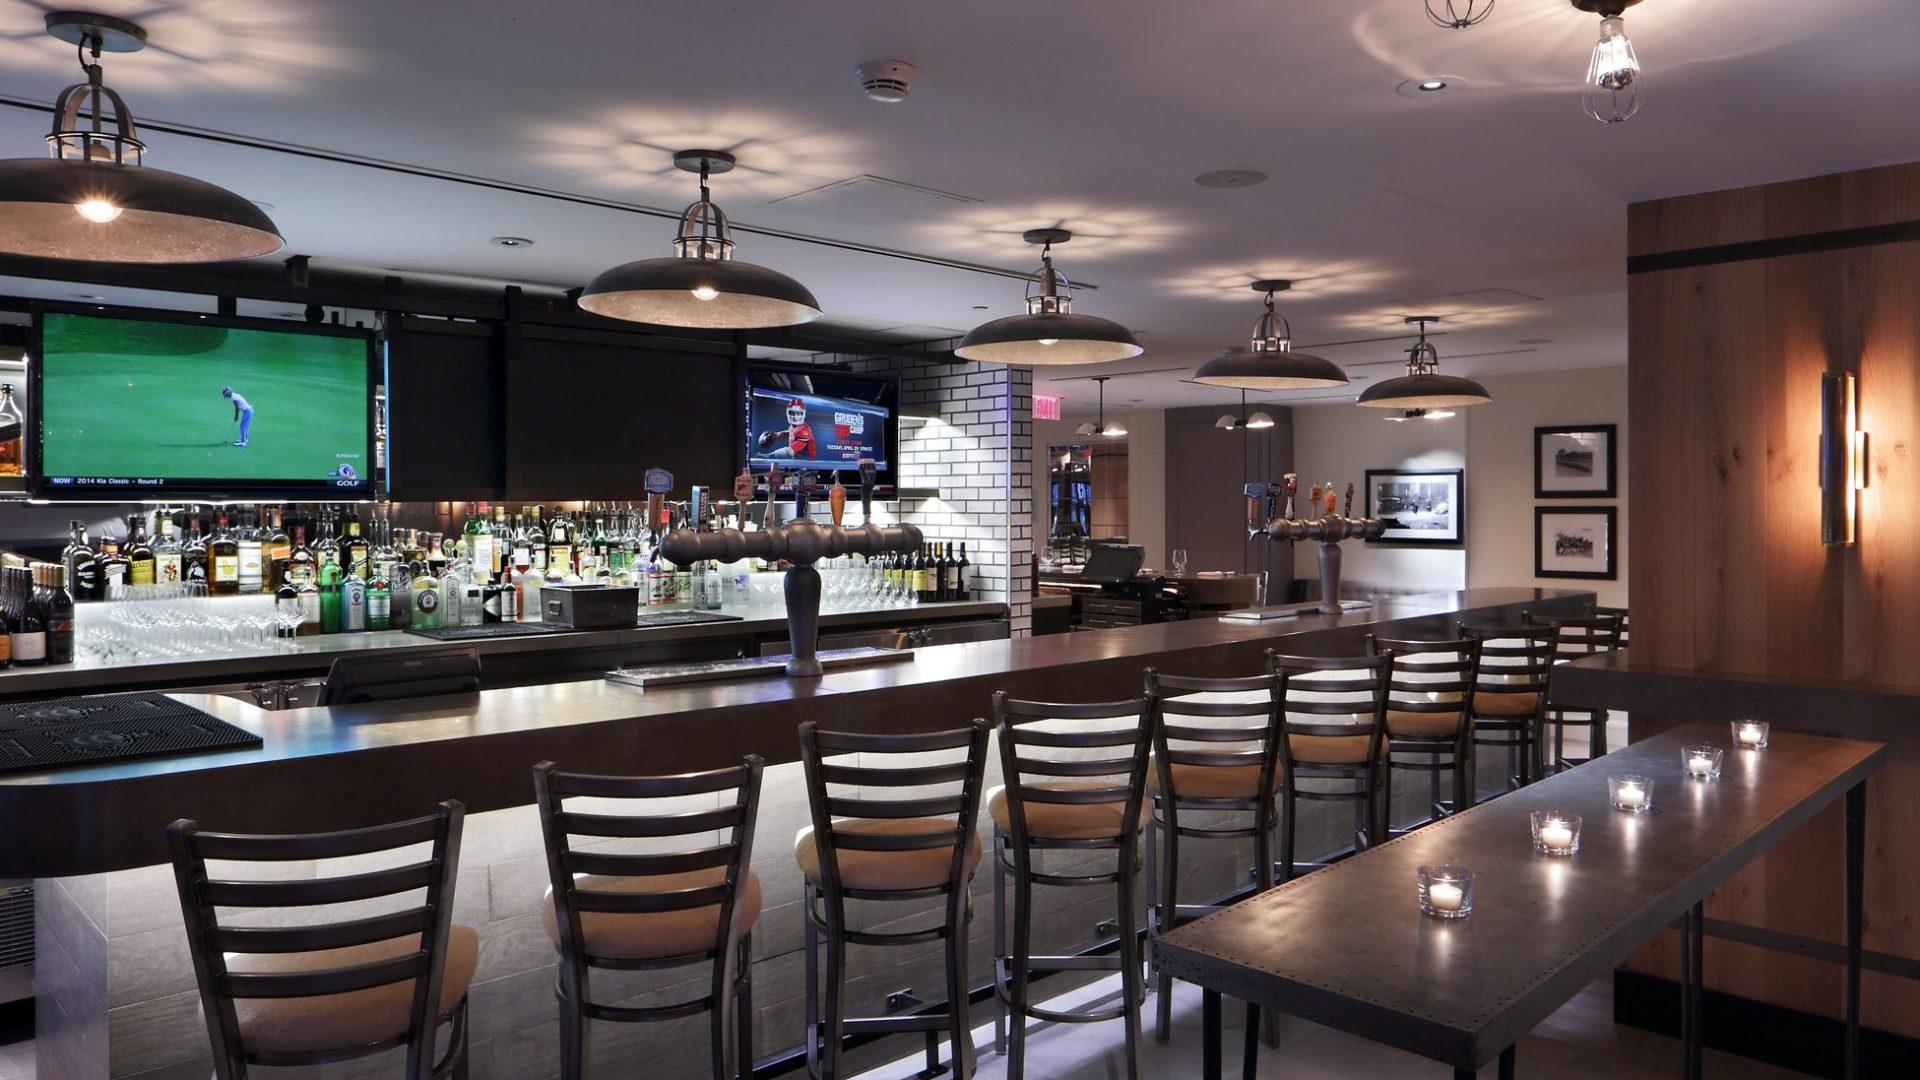 Boston Restaurant | Dine & Drink | Loews Boston Hotel